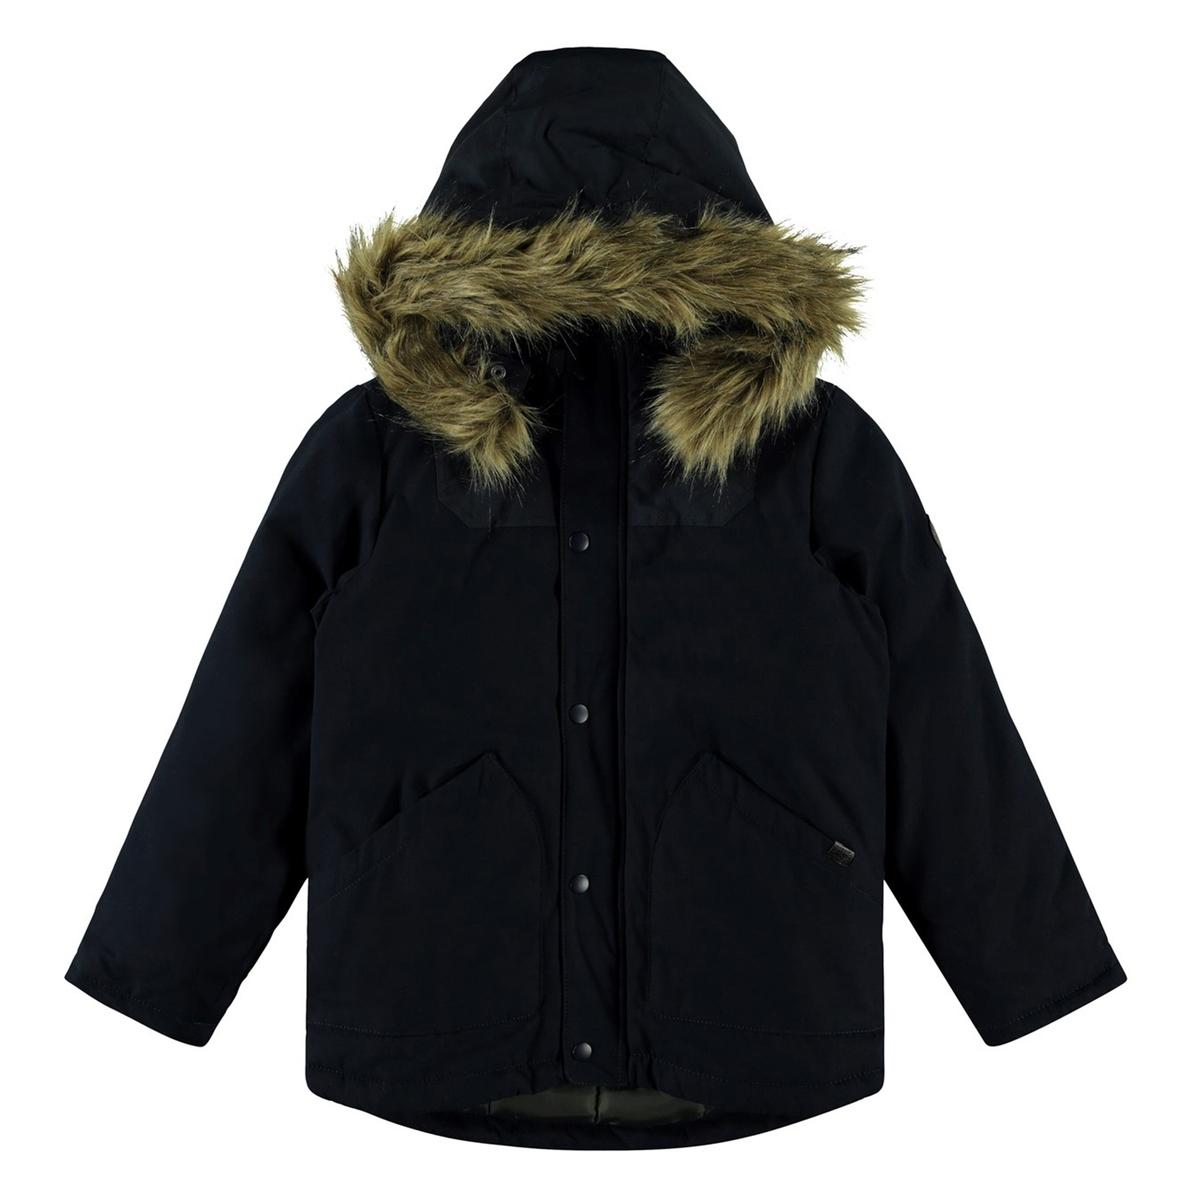 цена Парка La Redoute Зимняя с капюшоном 13 лет - 153 см синий онлайн в 2017 году